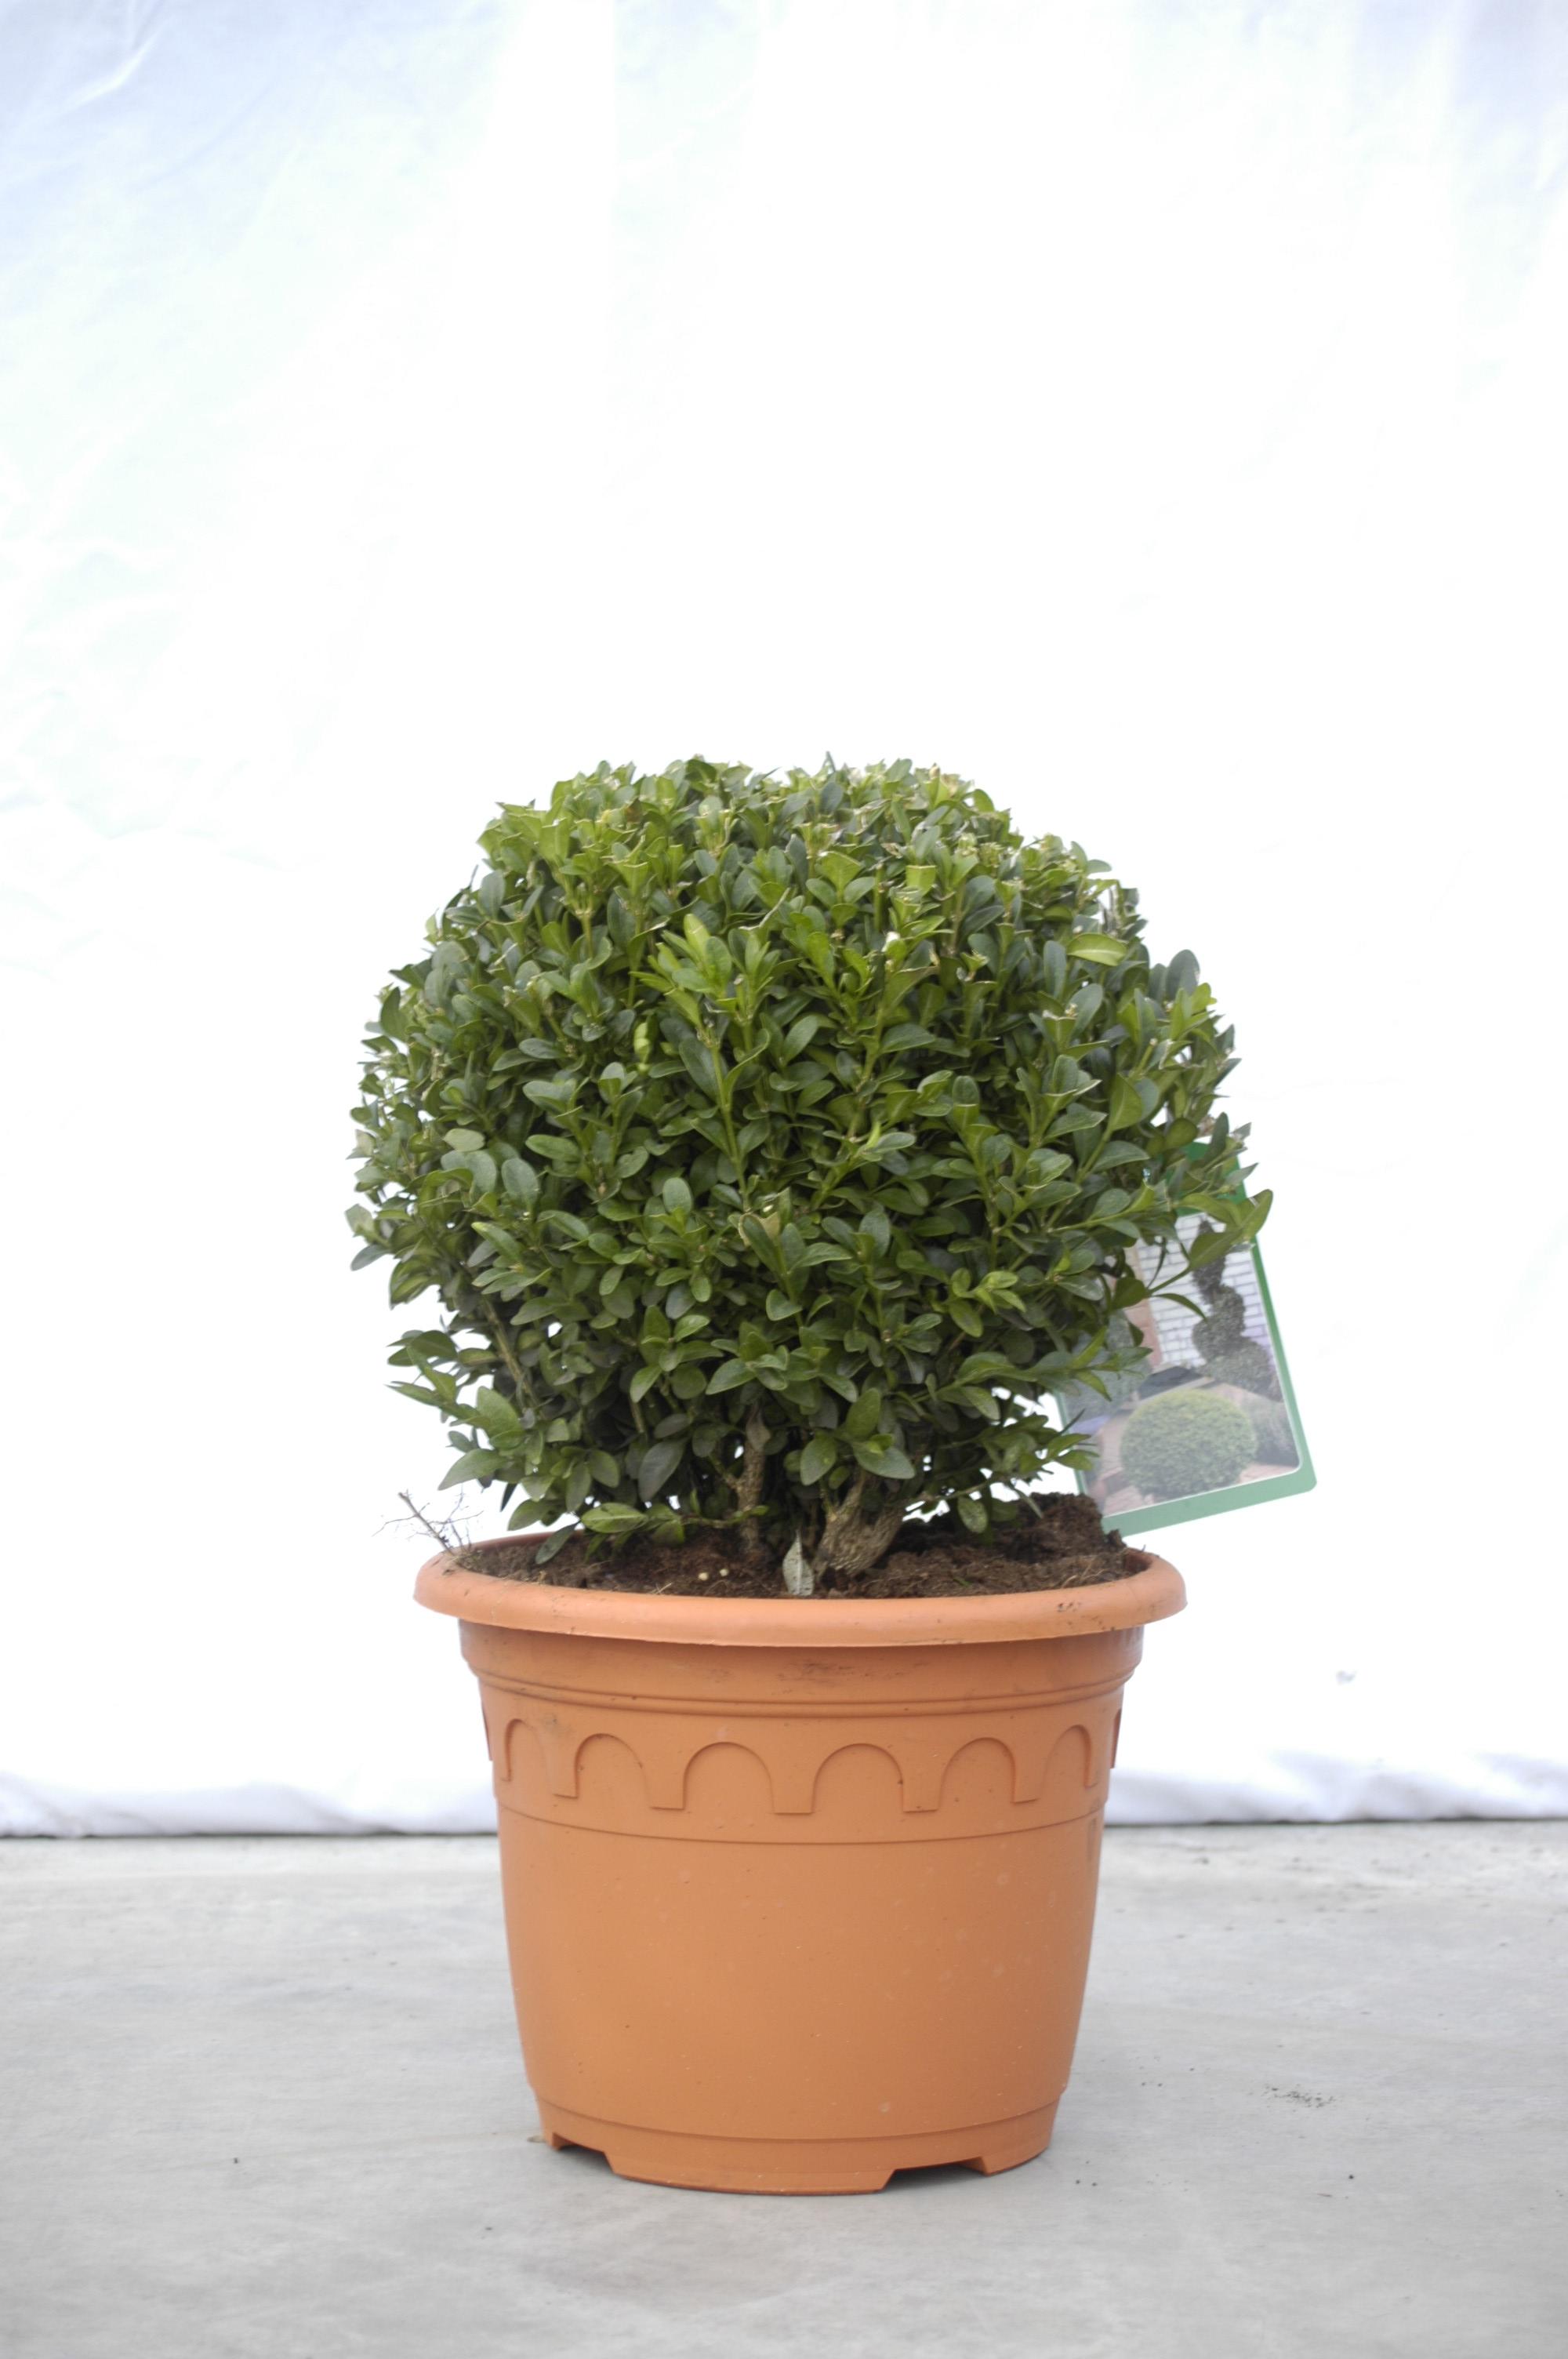 Buxkugel Online Kaufen Bux Wwwschmid Gartenpflanzende